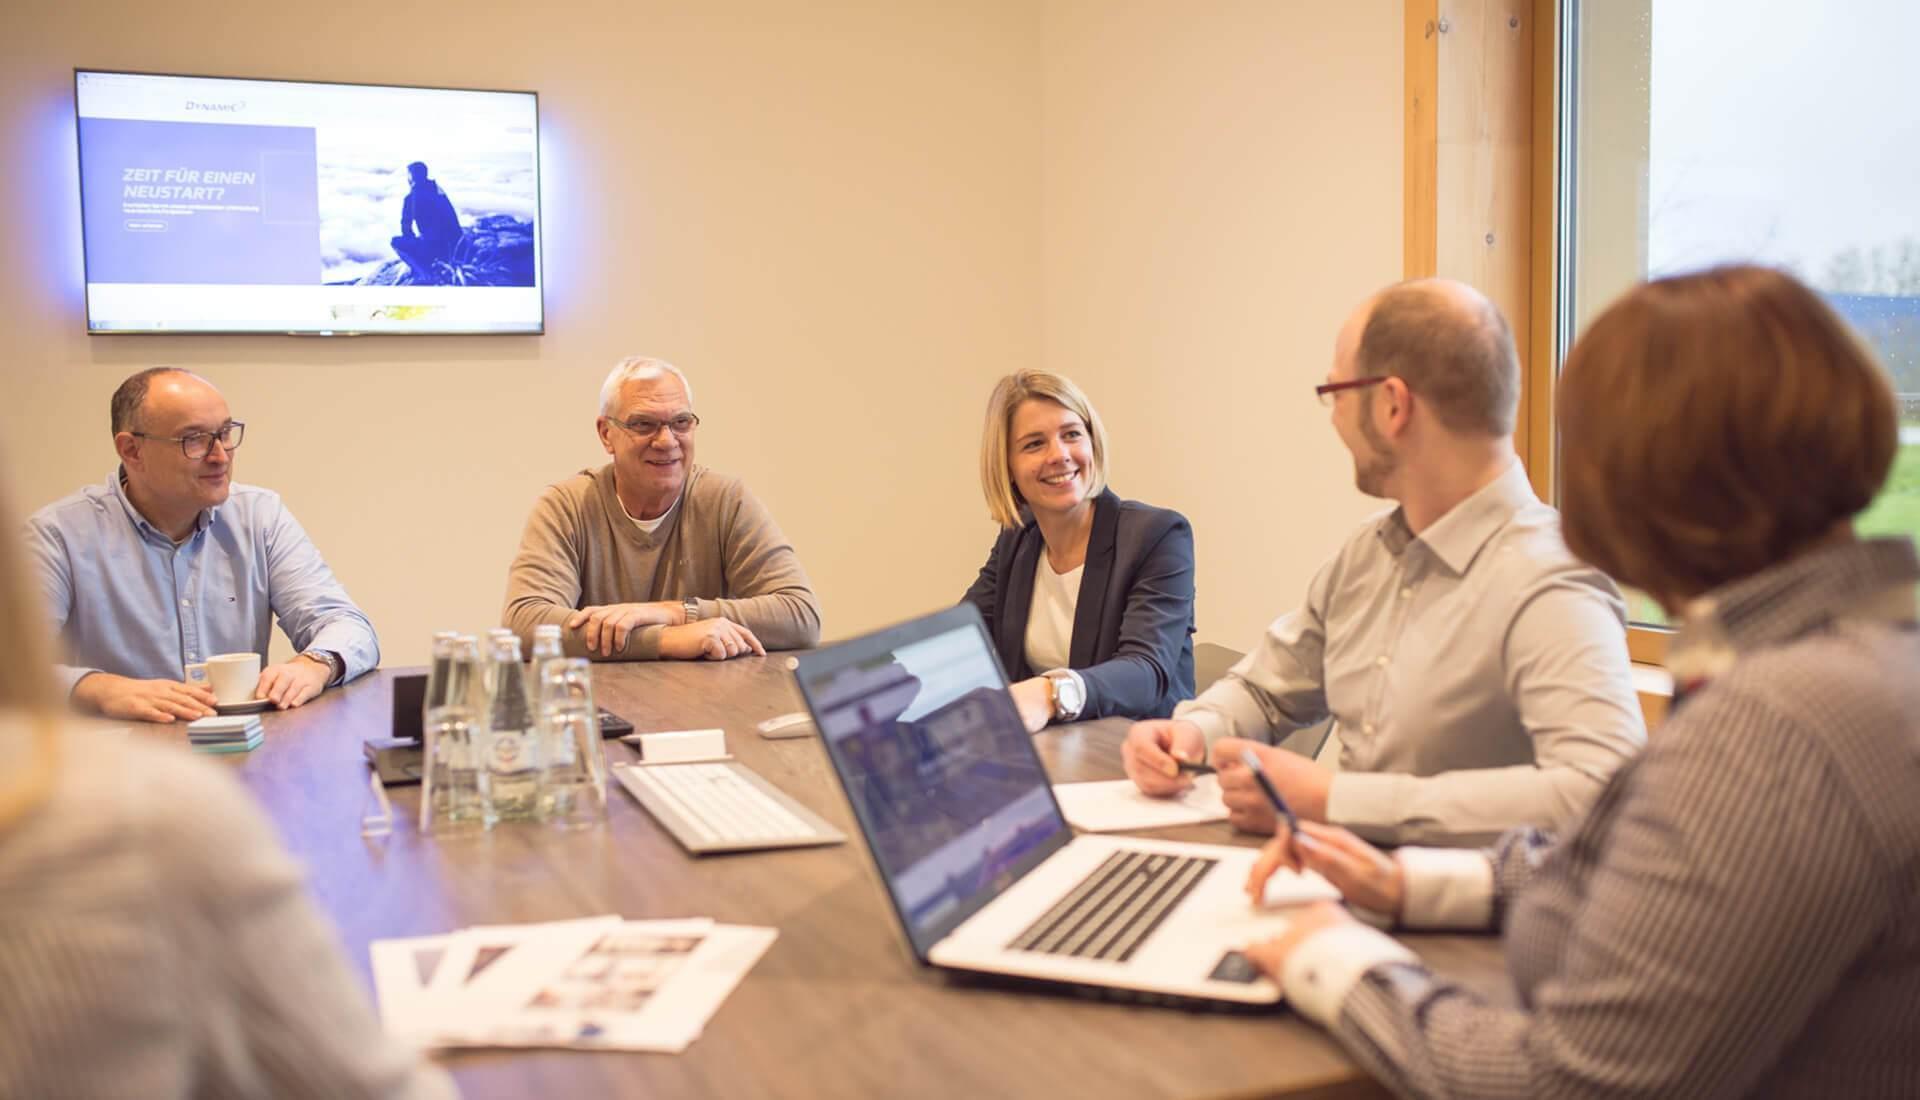 reintjes digital Agentur Meeting